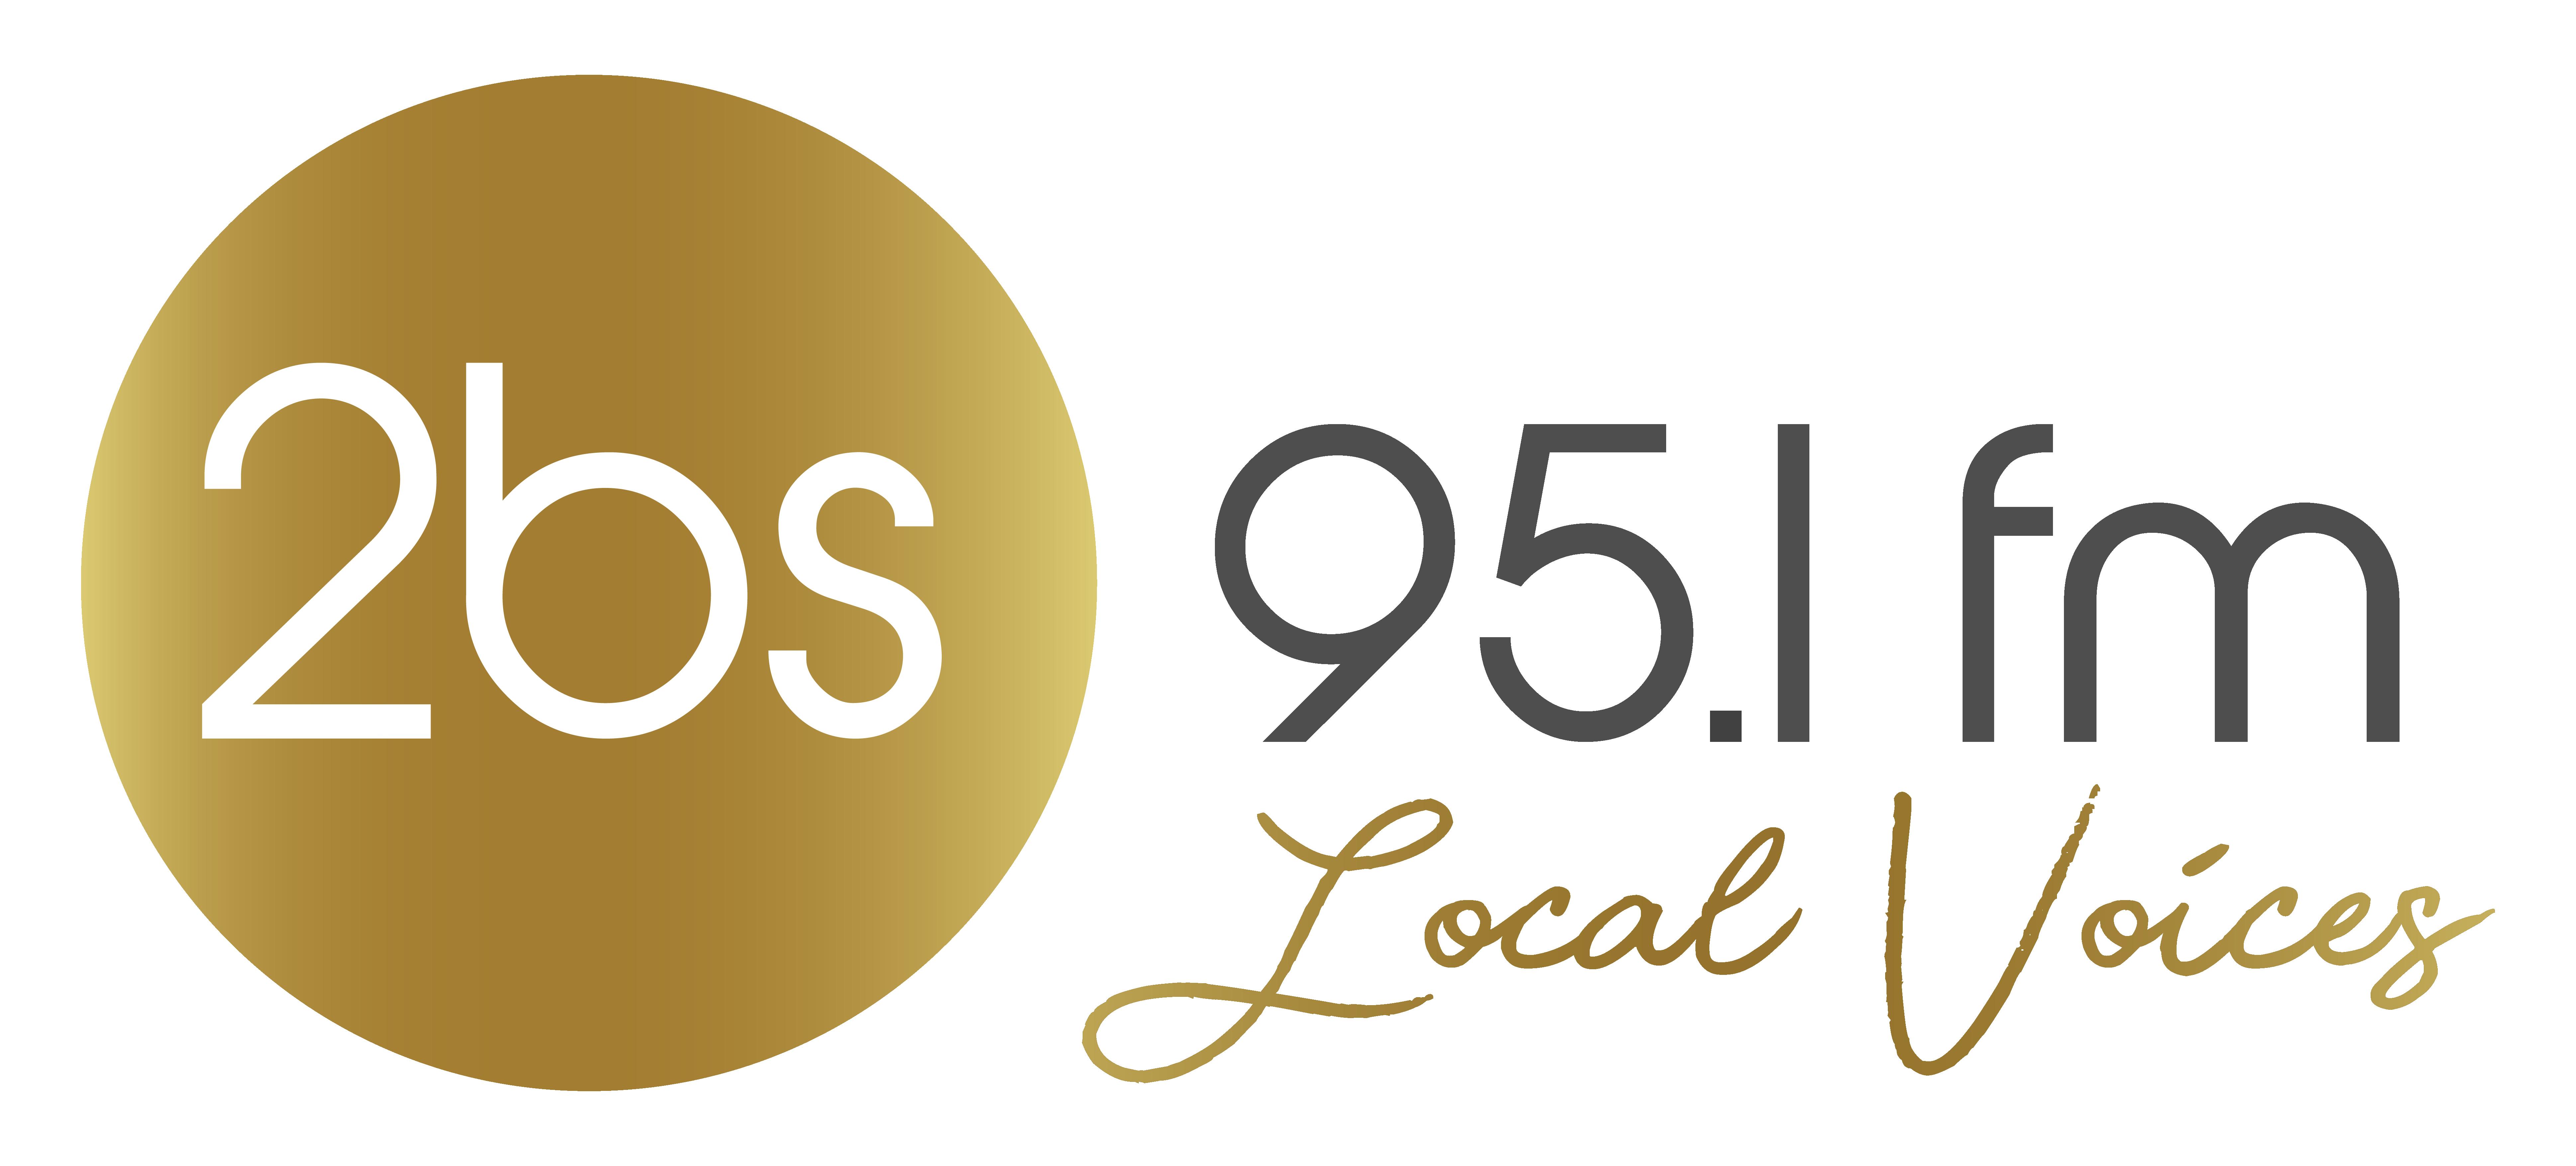 2BS 95.1FM